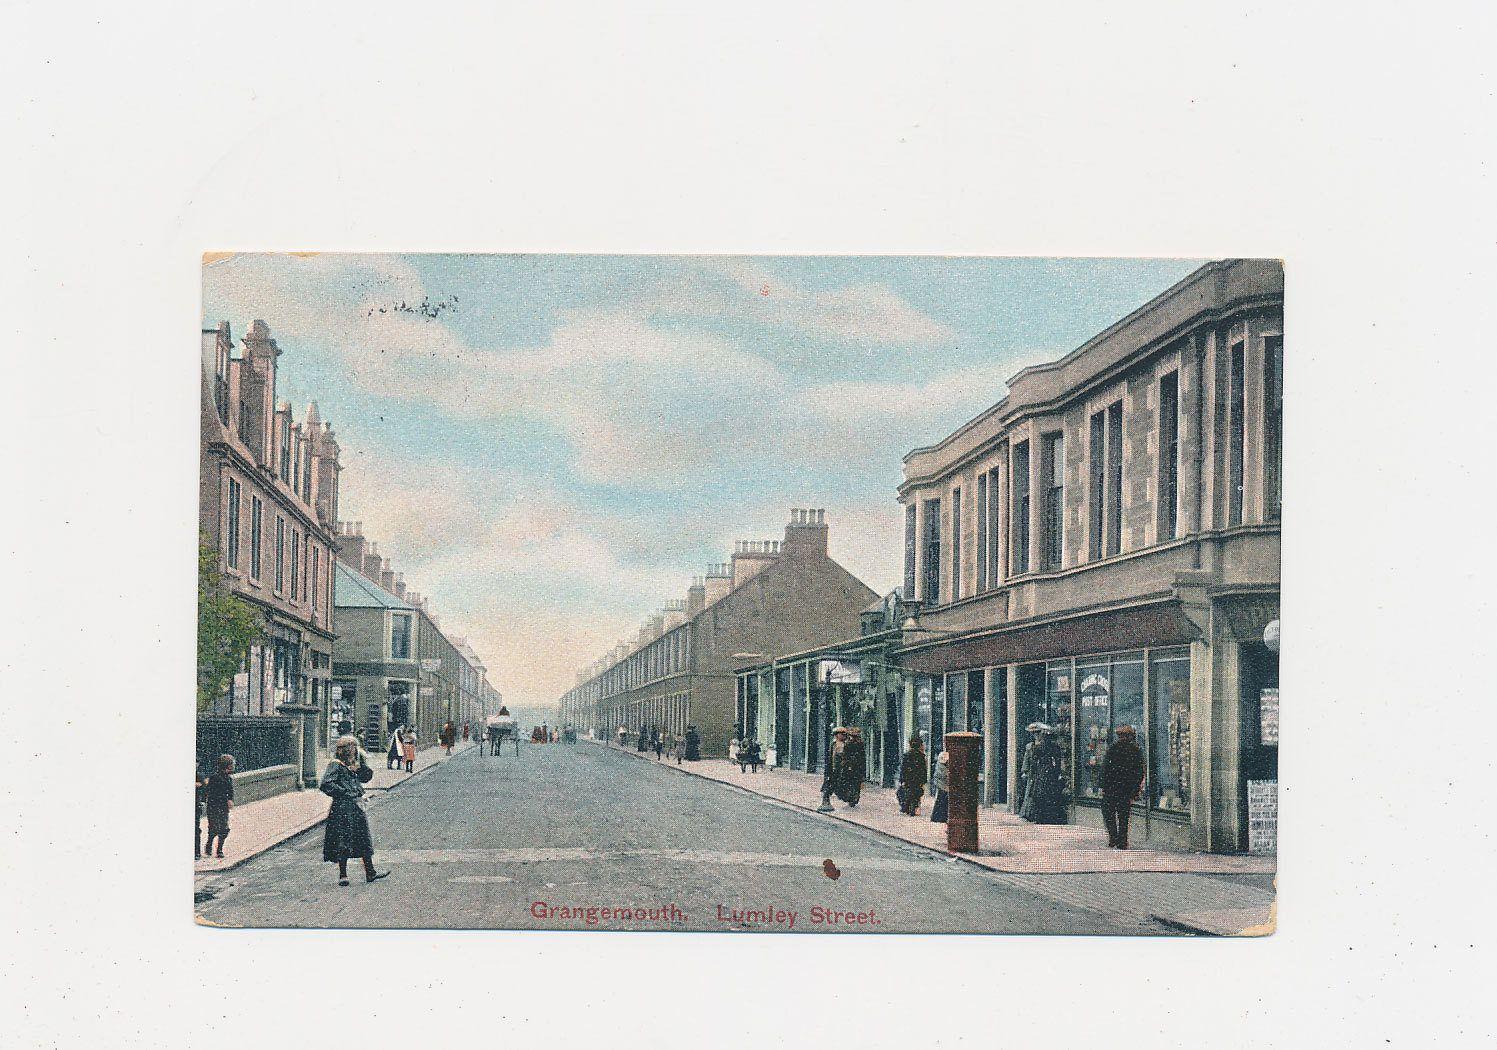 vintage Scottish postcard, street view Grangemouth, 1912 by mudintheUSA on Etsy